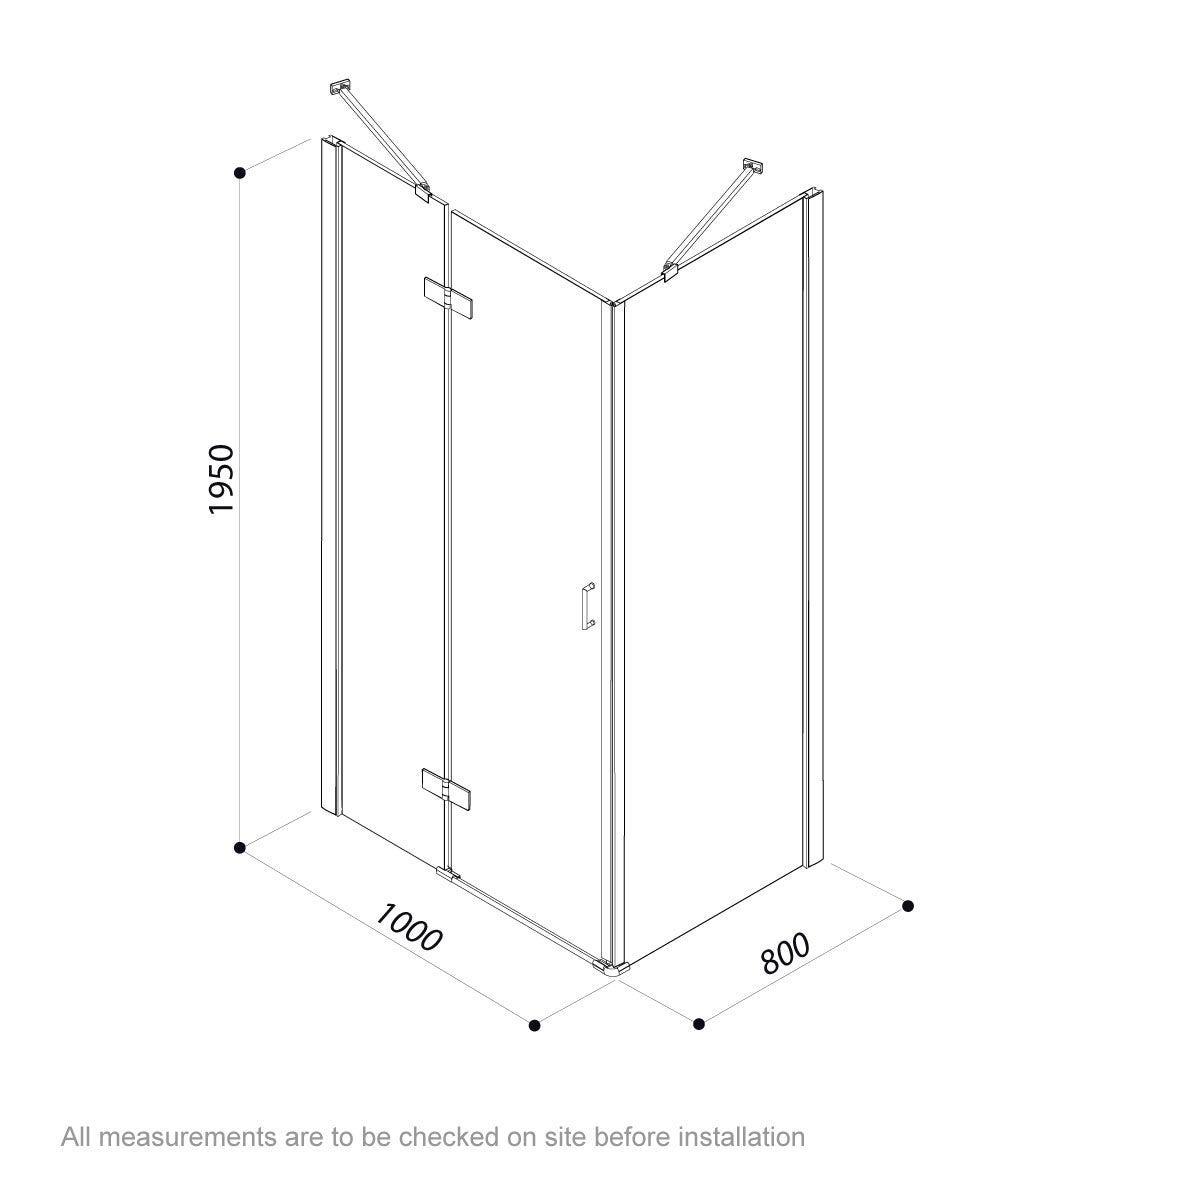 Dimensions for Jacuzzi Essentials hinged door shower enclosure 1000 x 800